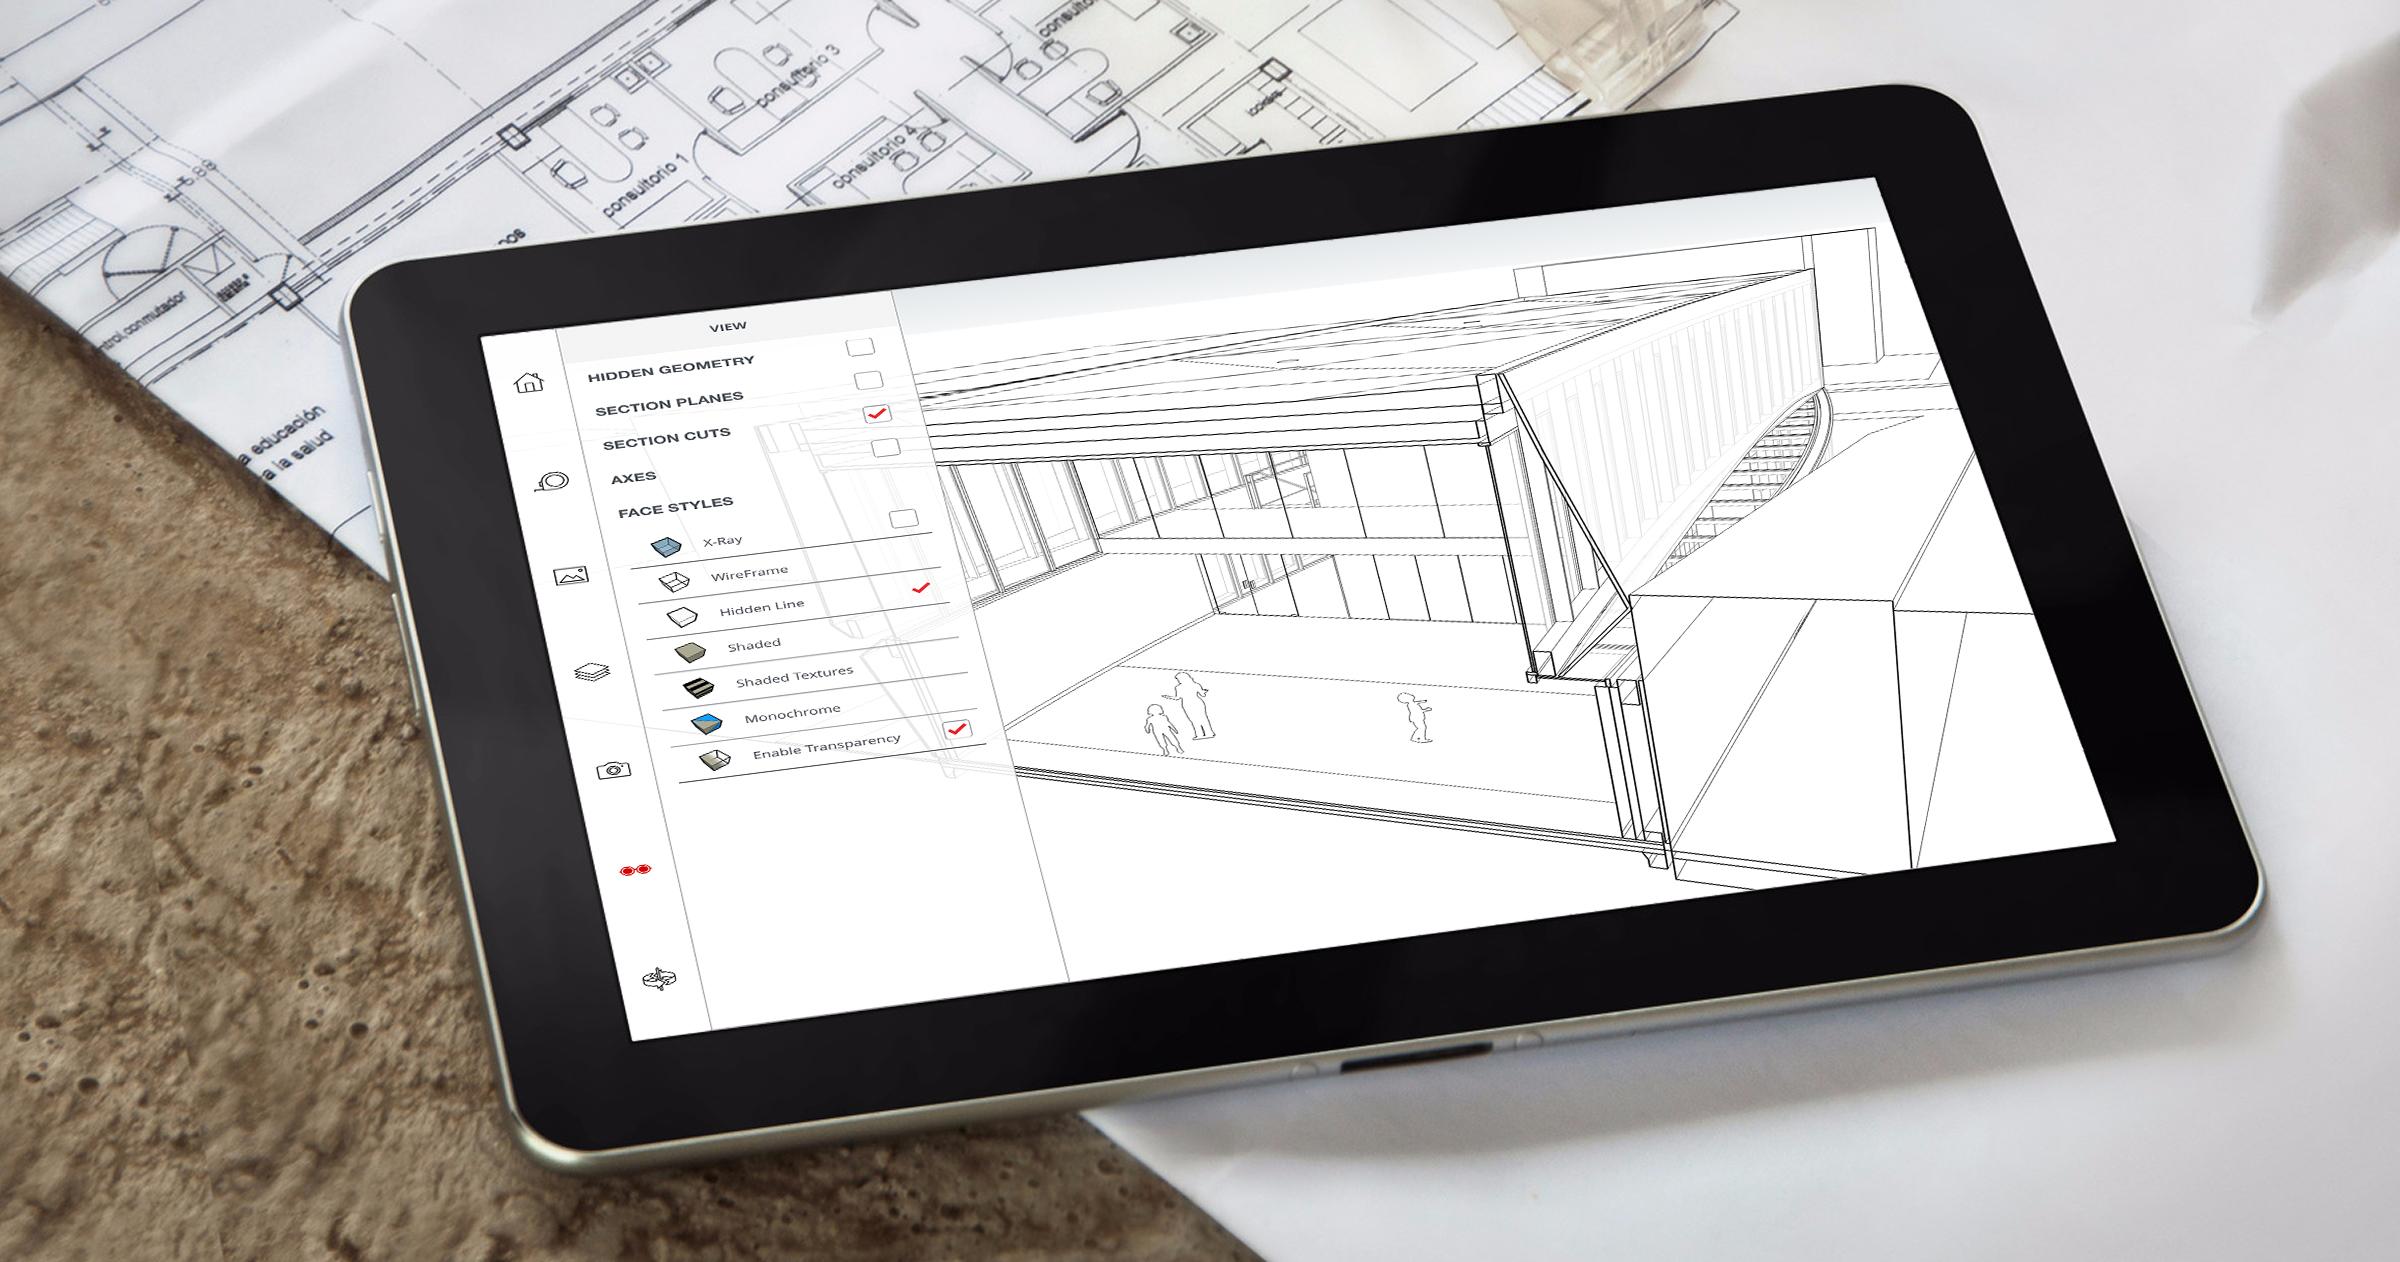 SketchUp Viewer na urządzenia mobilne z systemami Android i iOS.